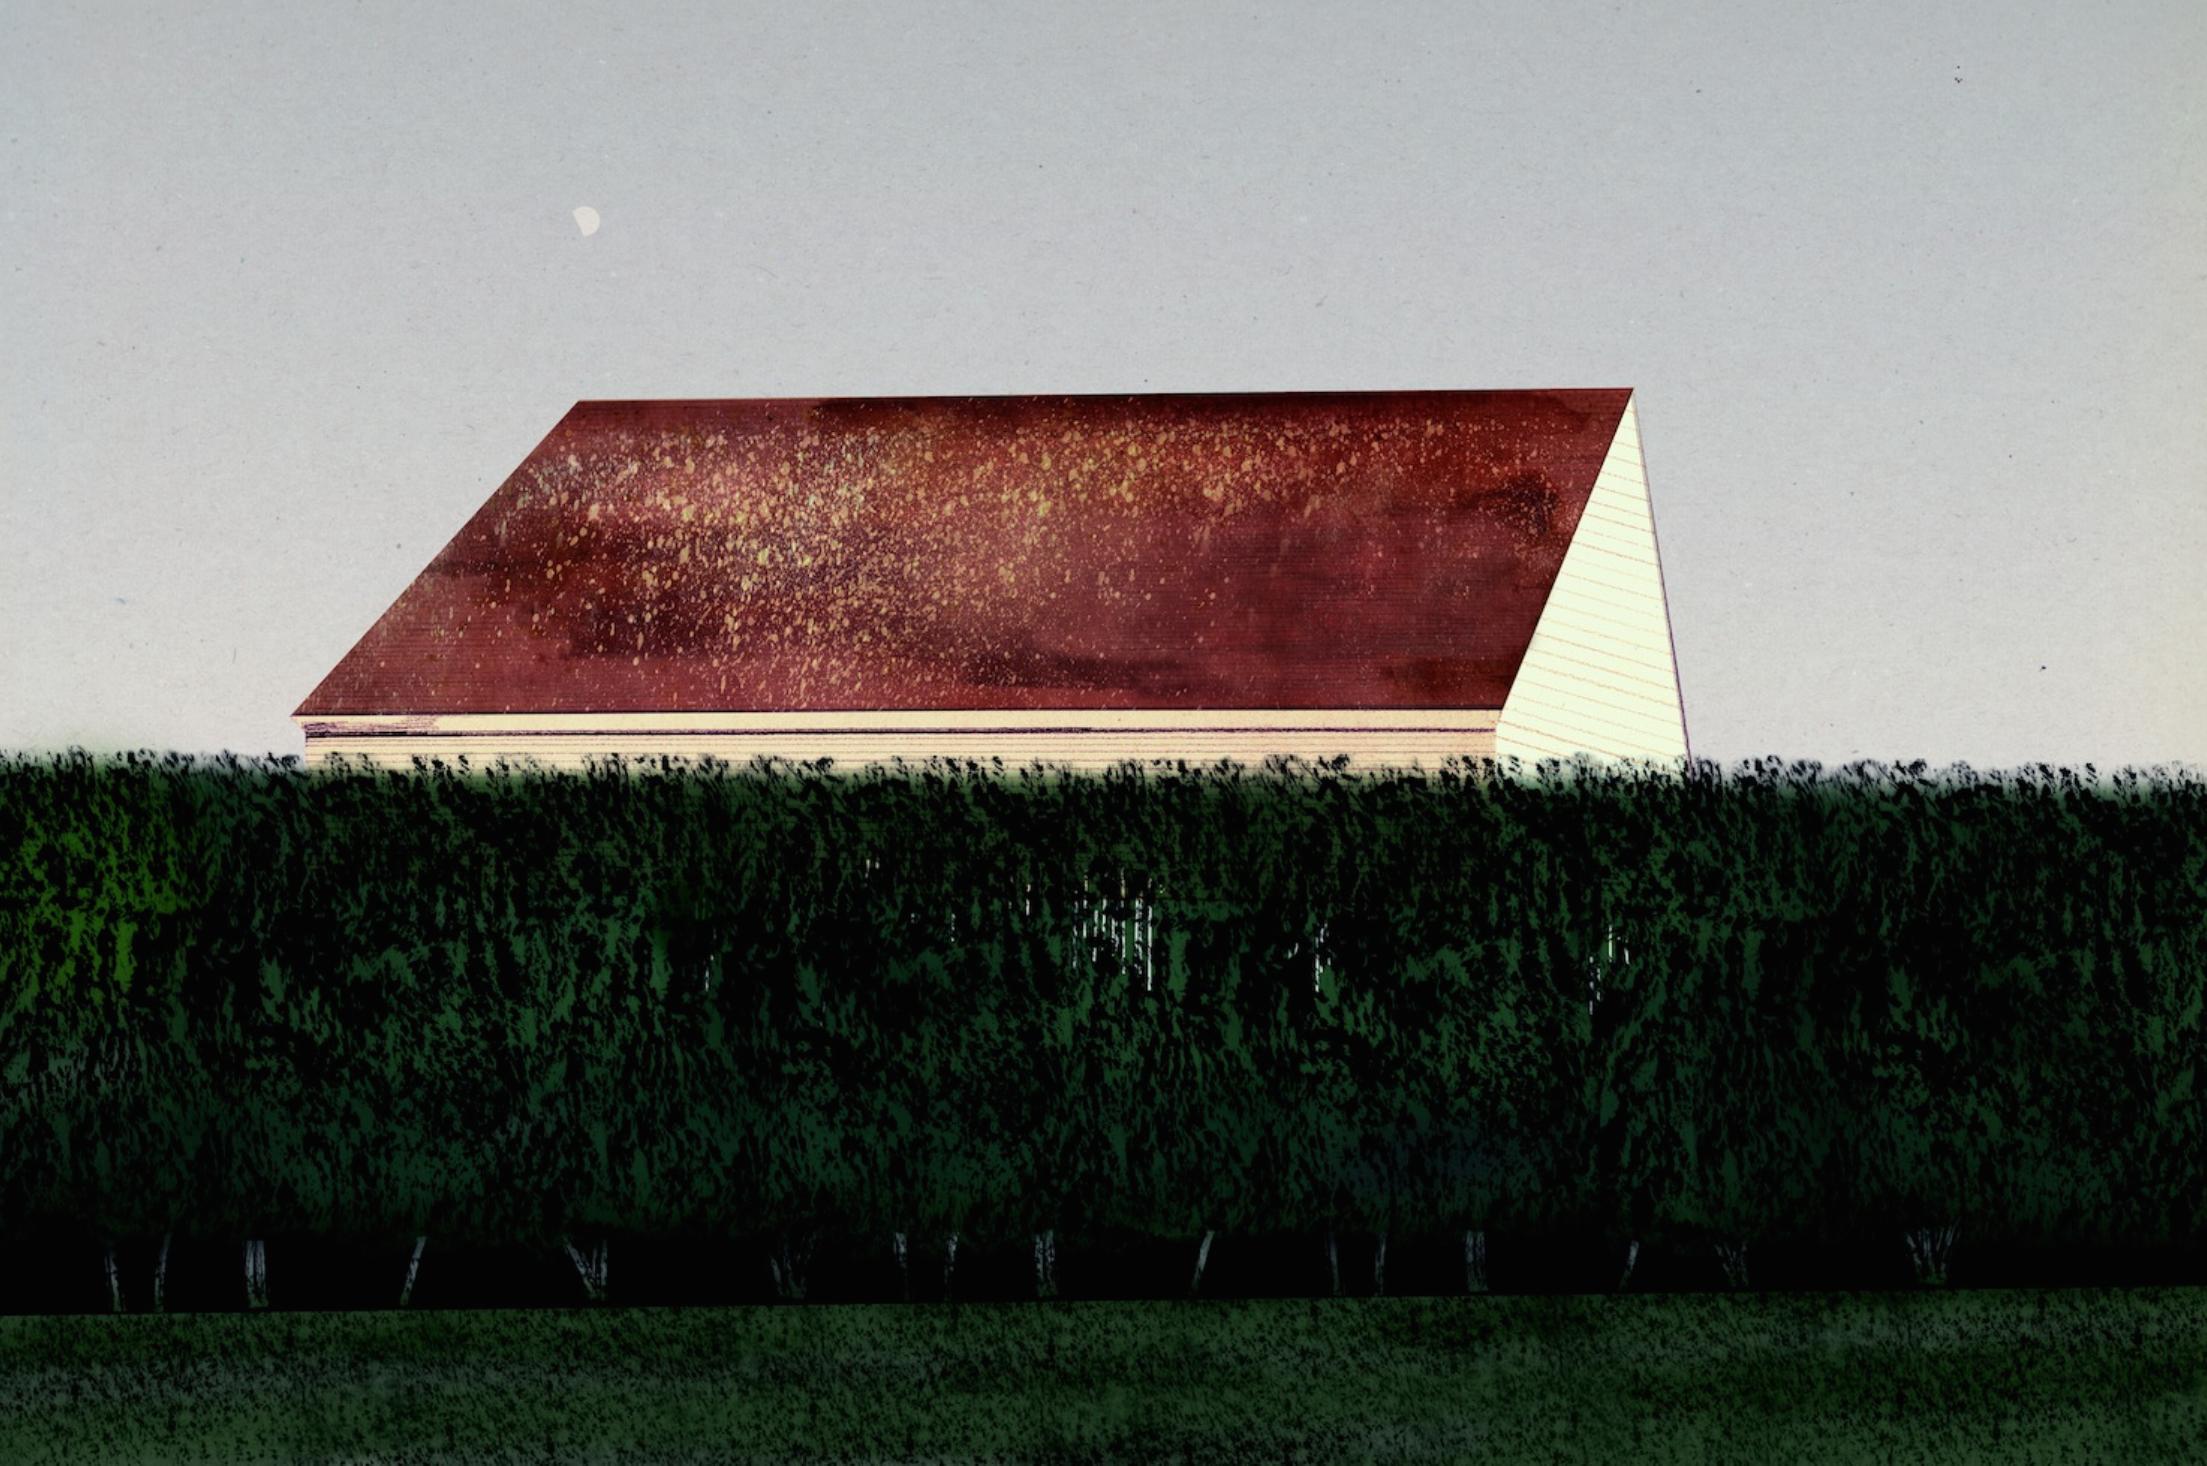 Illustration: Olof  Svenblad based on photo by Emily Cross.